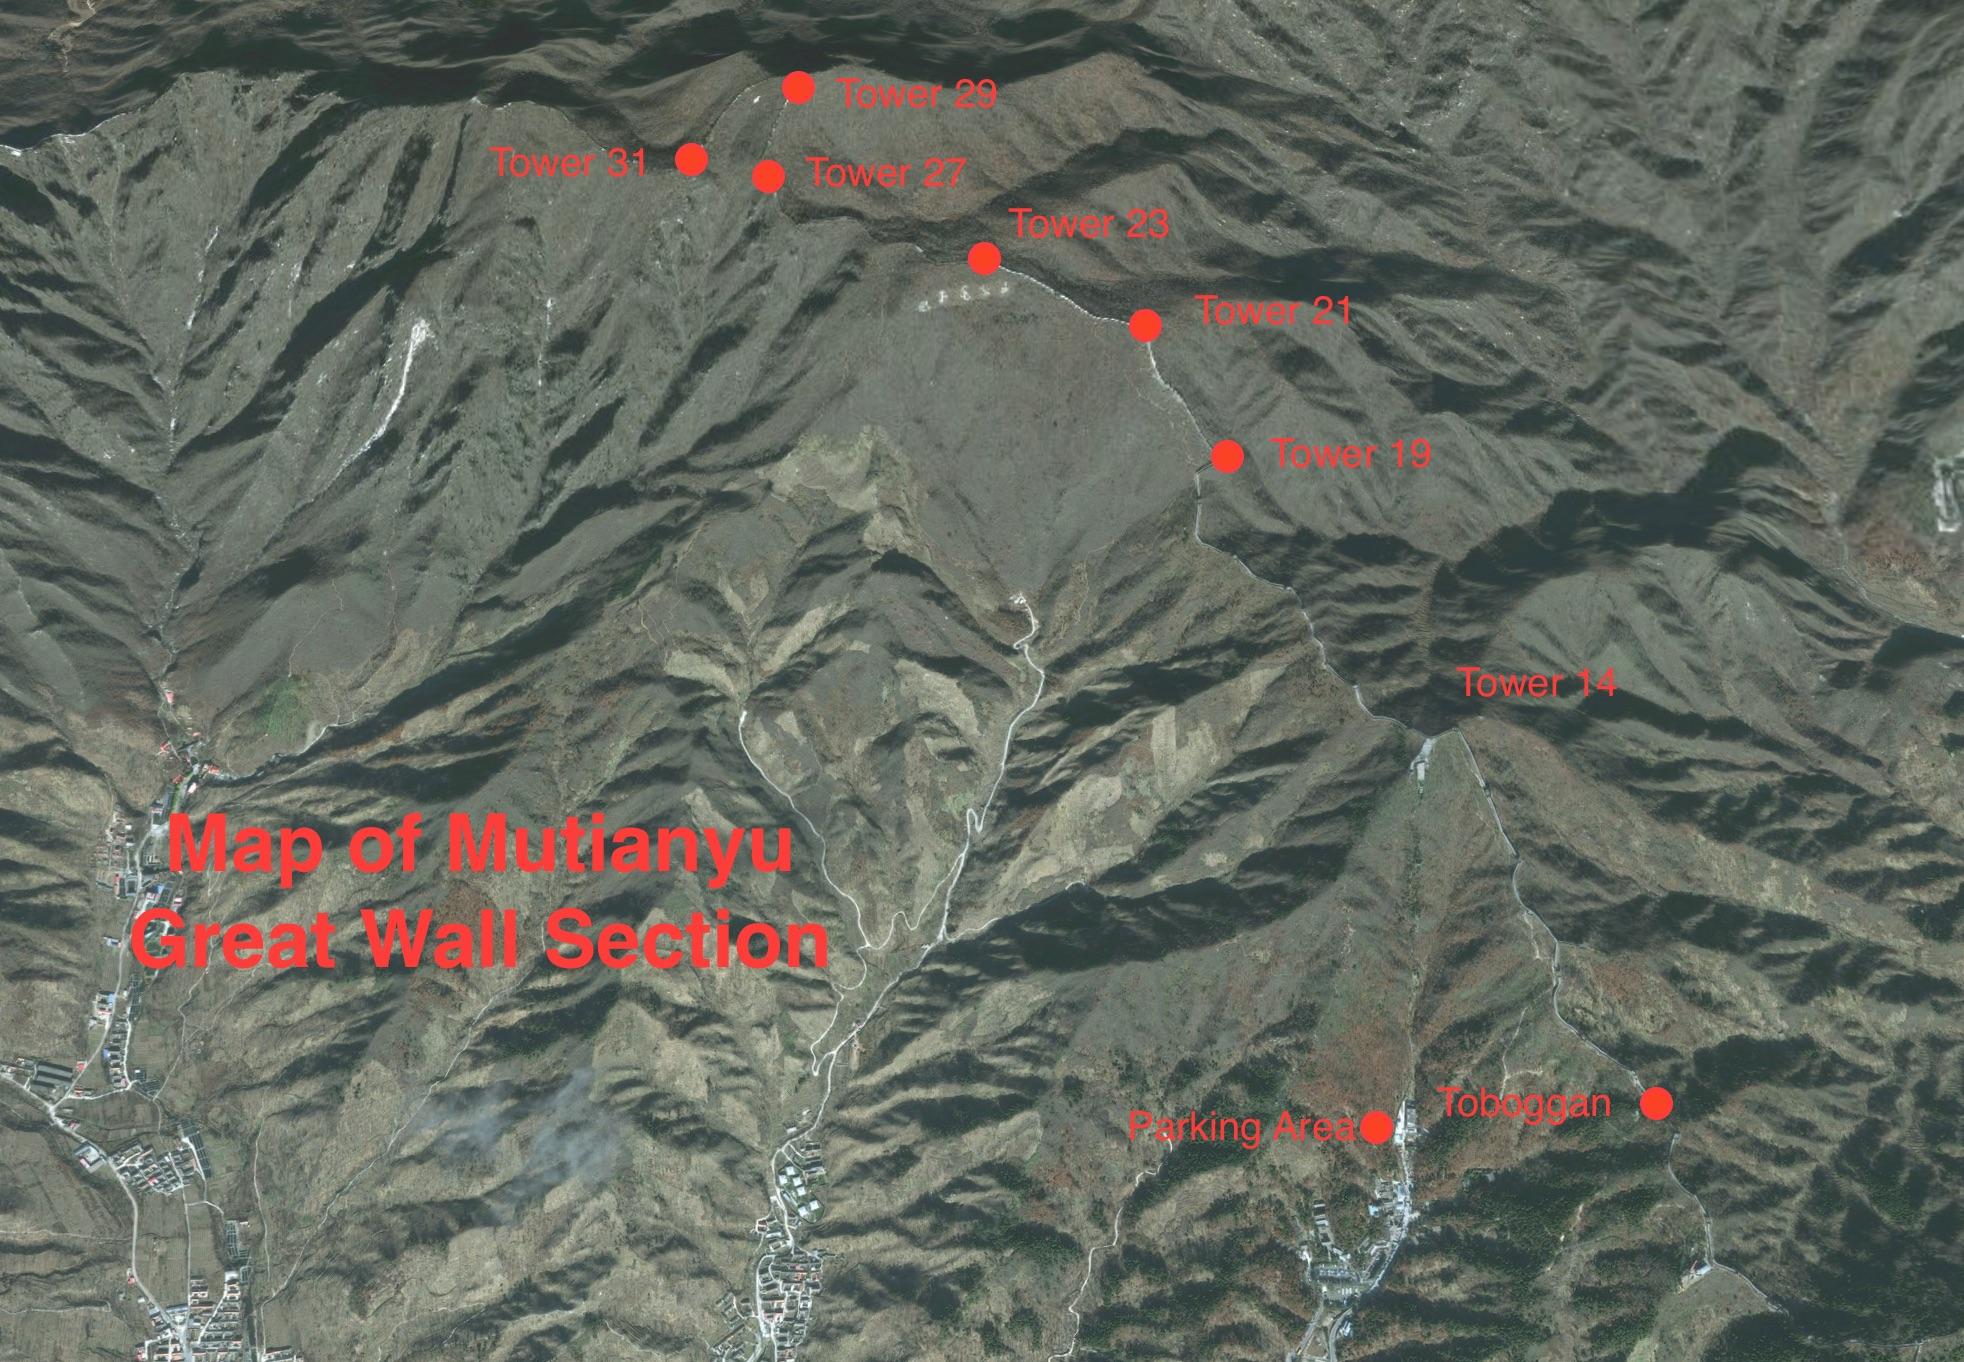 Mutianyu Great Wall Section